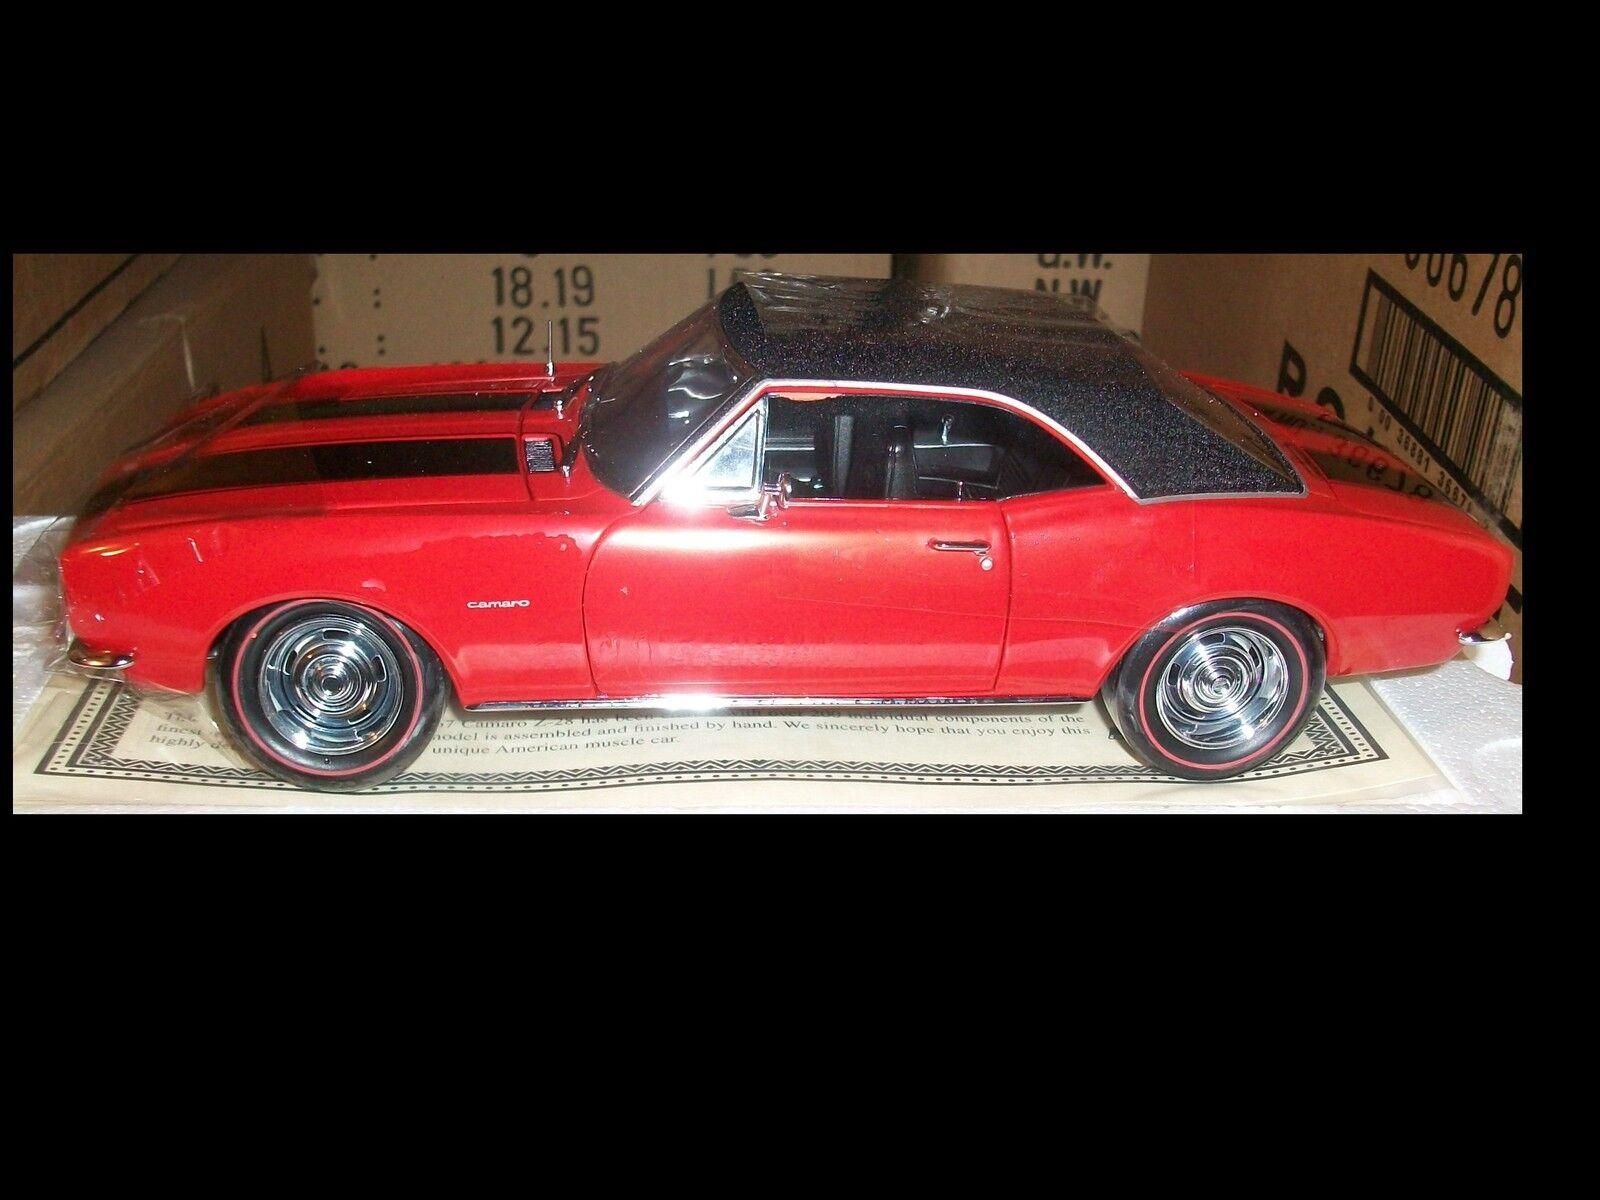 1967 Chevrolet Camaro Z28 Regal rouge 1 18 ertl american muscle 33272